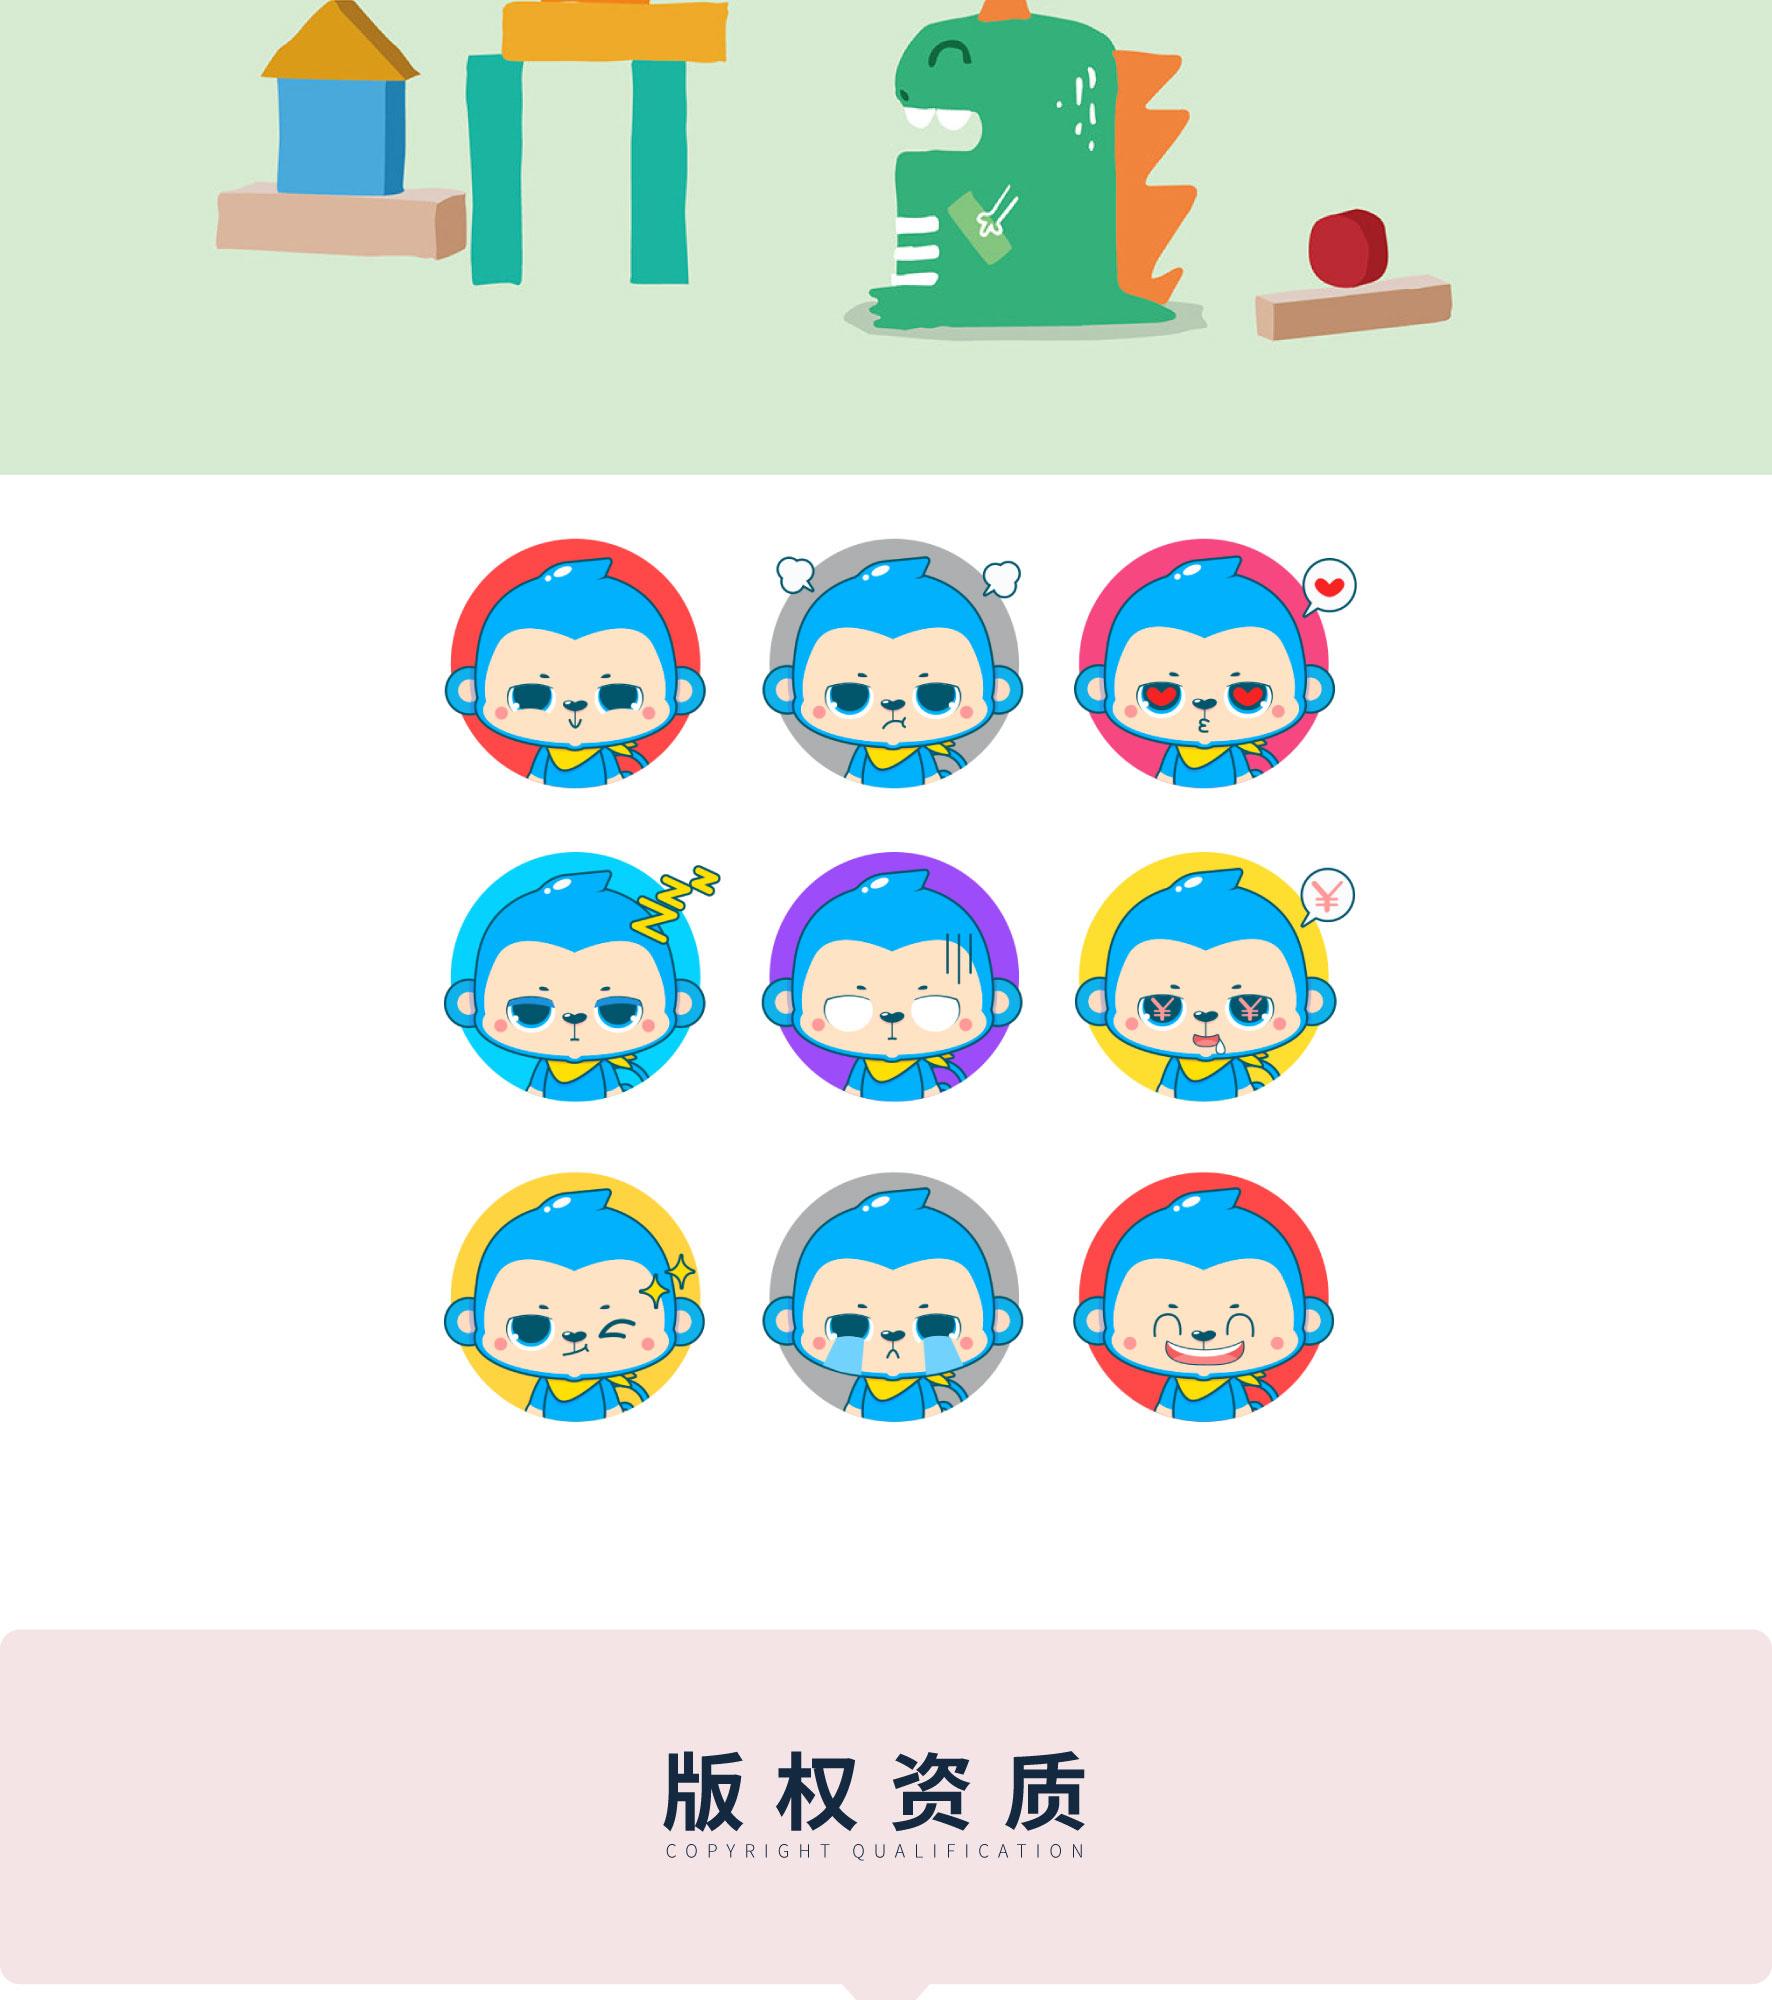 Q版头像吉祥物卡通形象商业插画Q版手绘表情包漫画logo高品质原创表情包设计微信表情QQ表情卡通形象